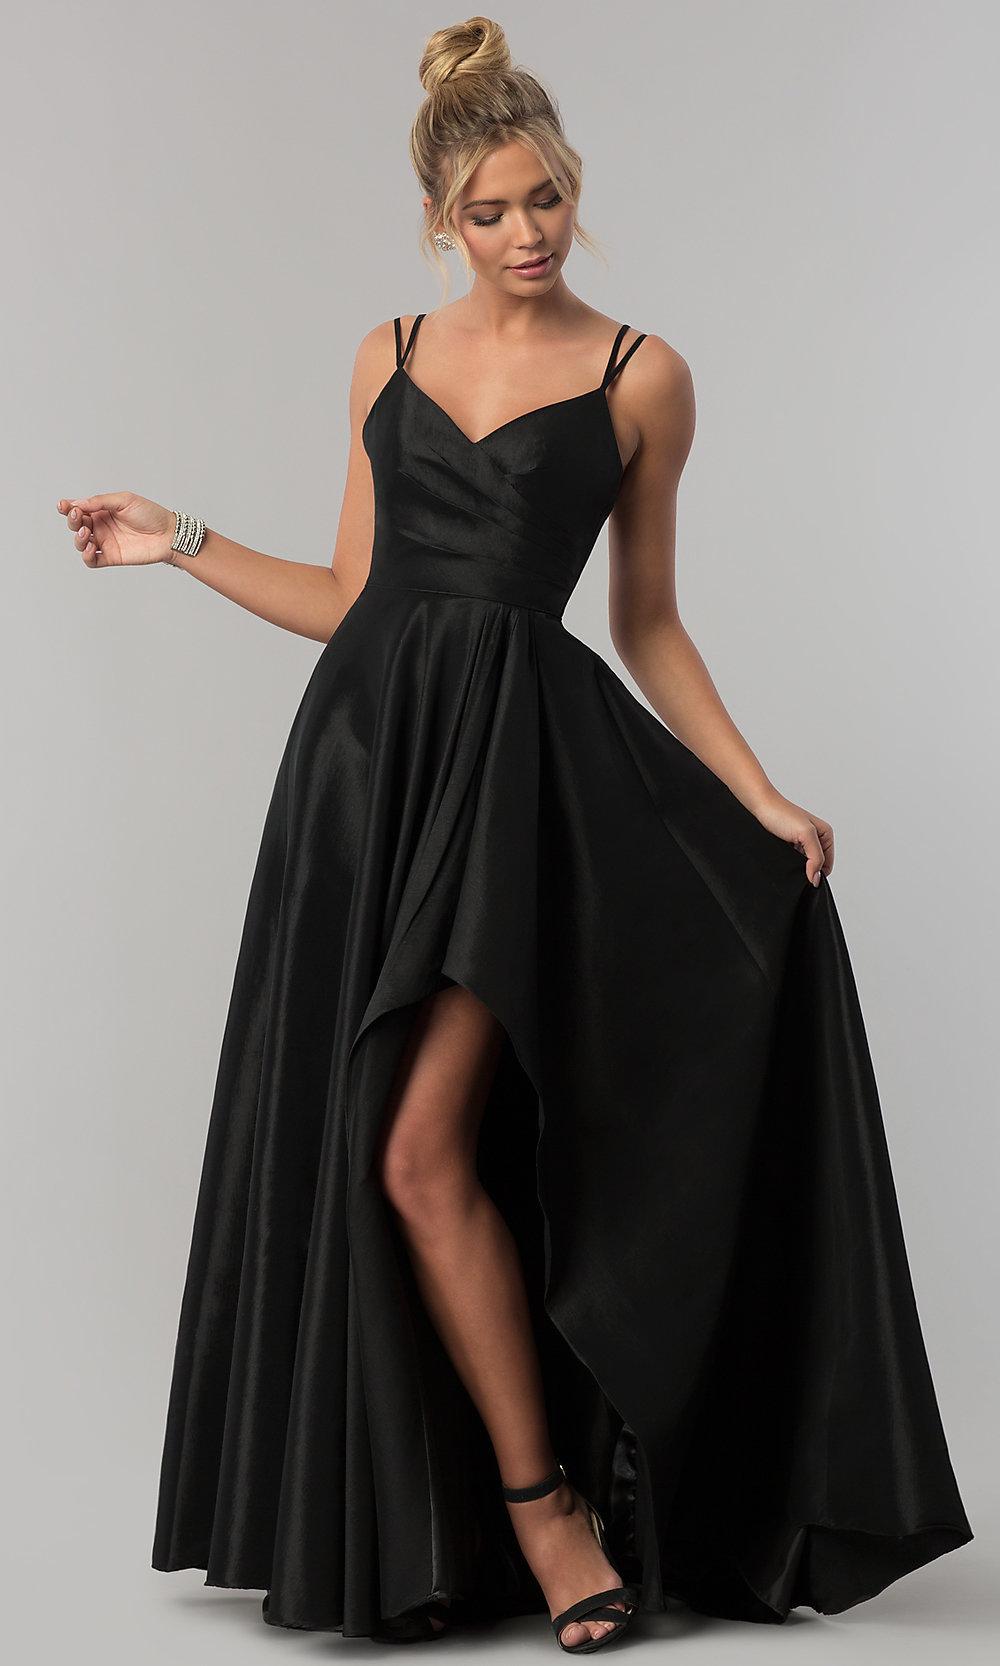 Stretch-taffeta high-low black prom dress